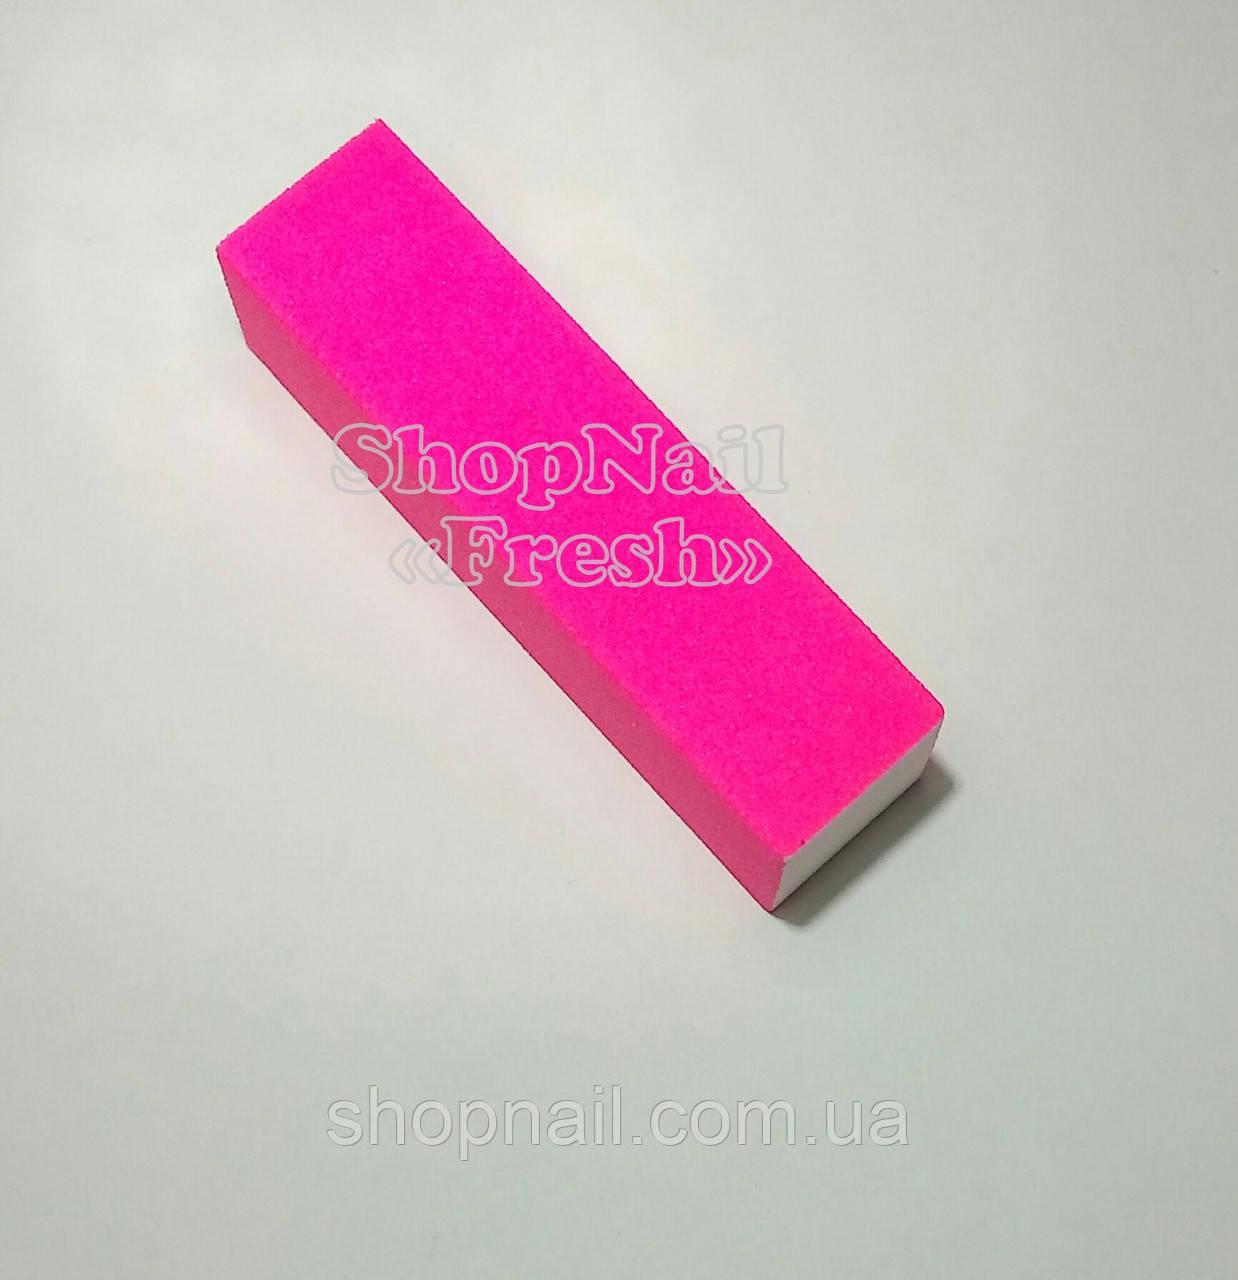 Баф для ногтей 4-х сторонний, розовый